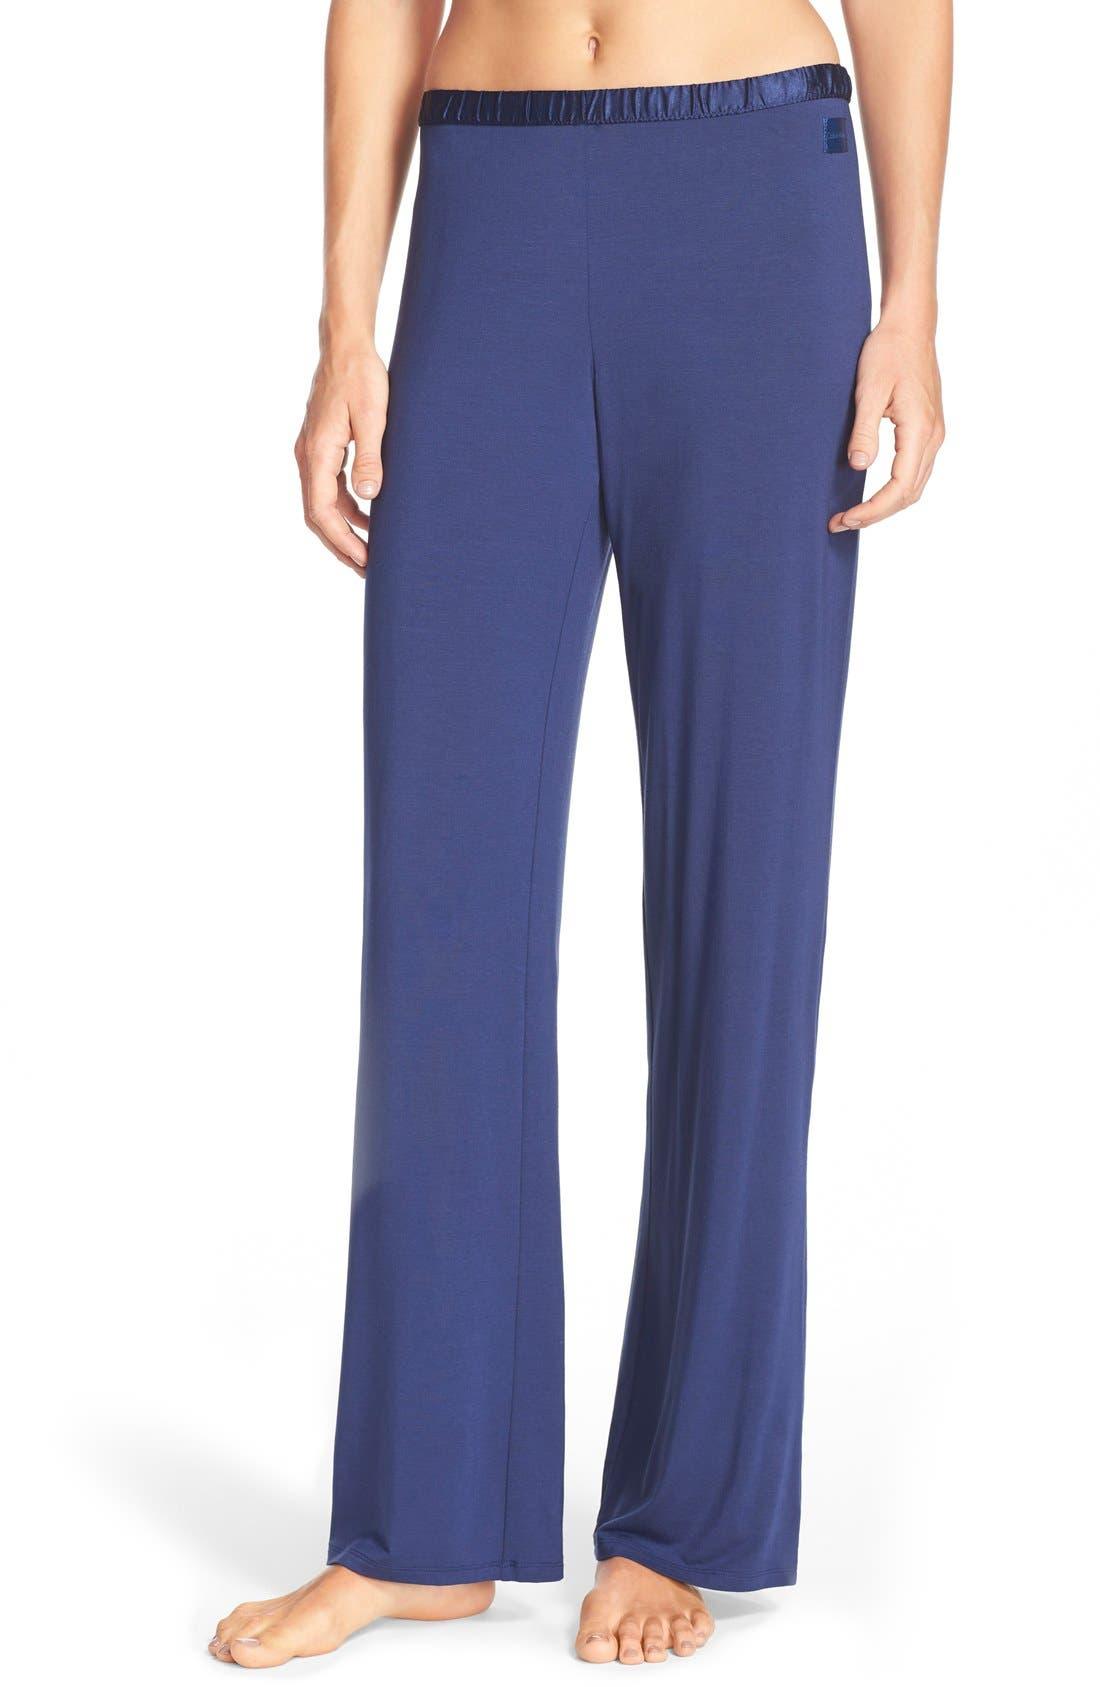 Alternate Image 1 Selected - Calvin Klein 'Essentials' Satin Waist Pajama Pants